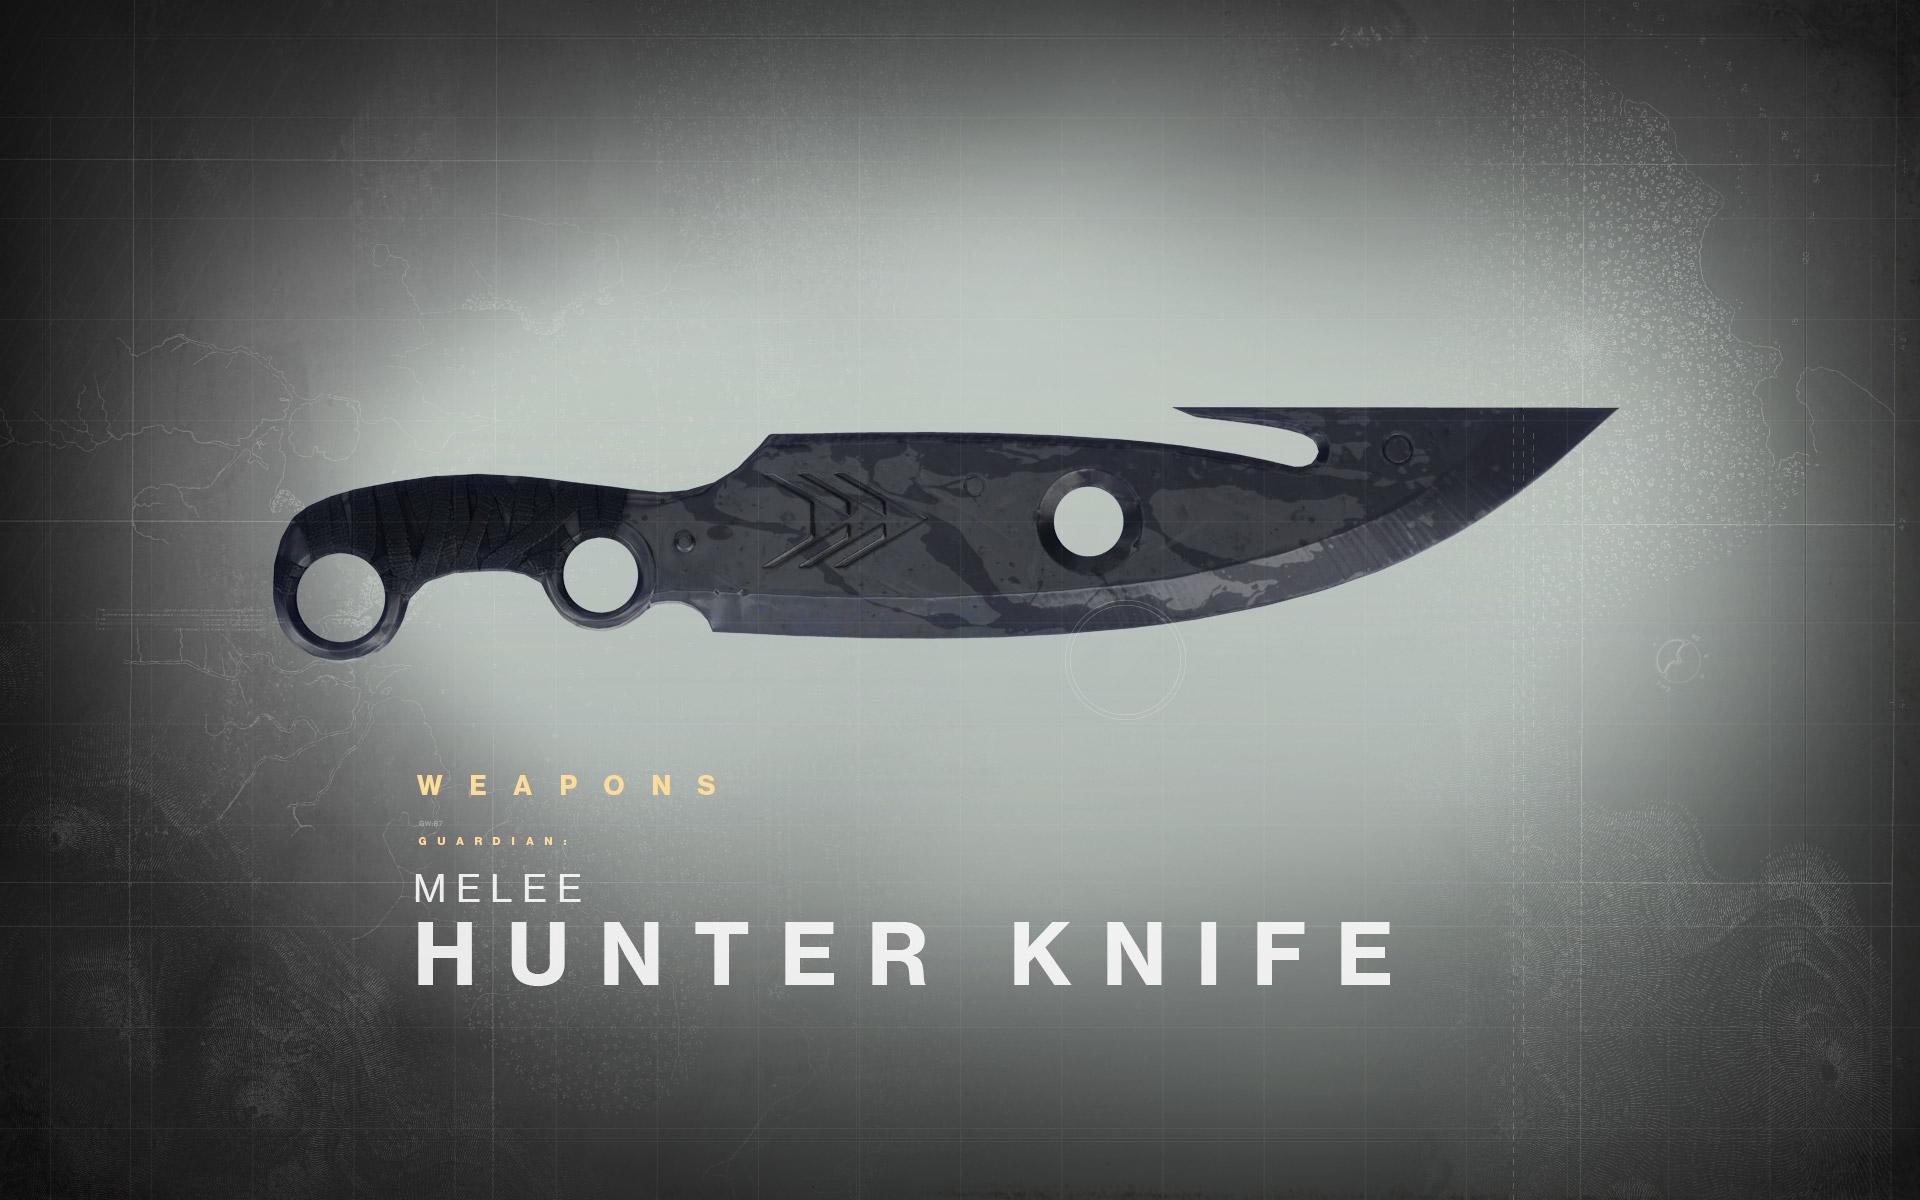 Destiny Drawing Board The Hunters Knife &gt News  Bungienet